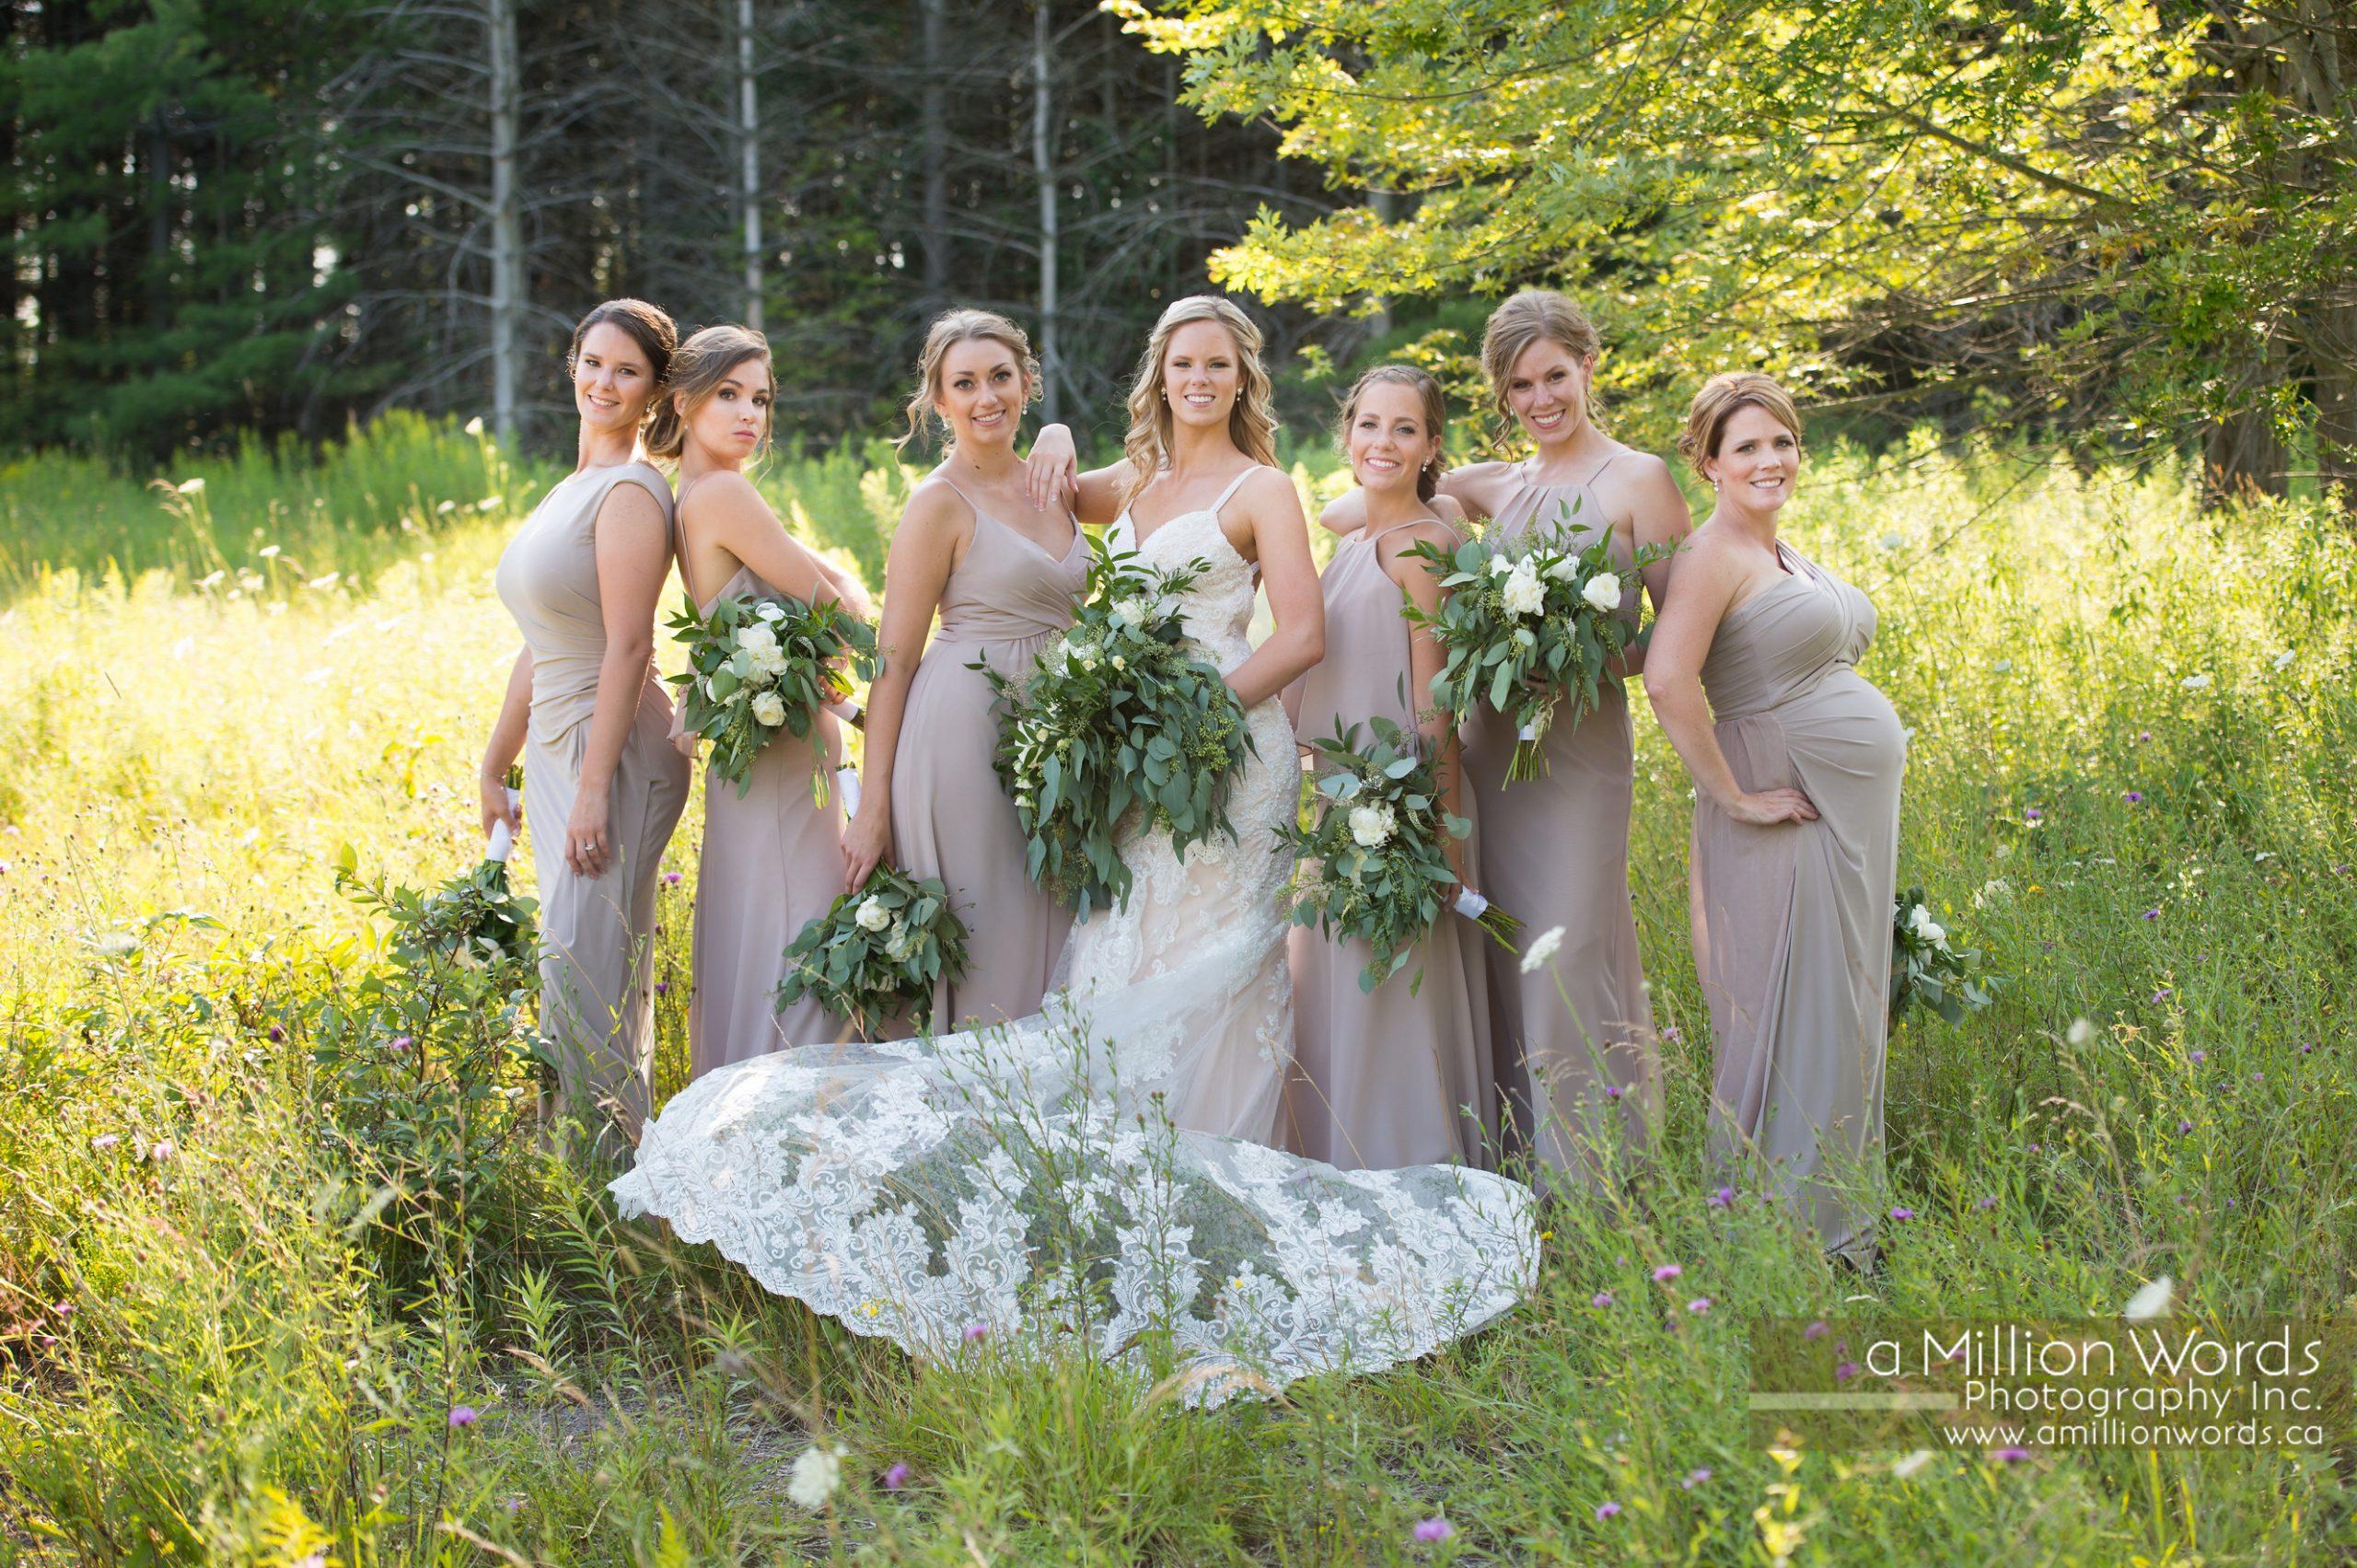 arthur_wedding_photographer51